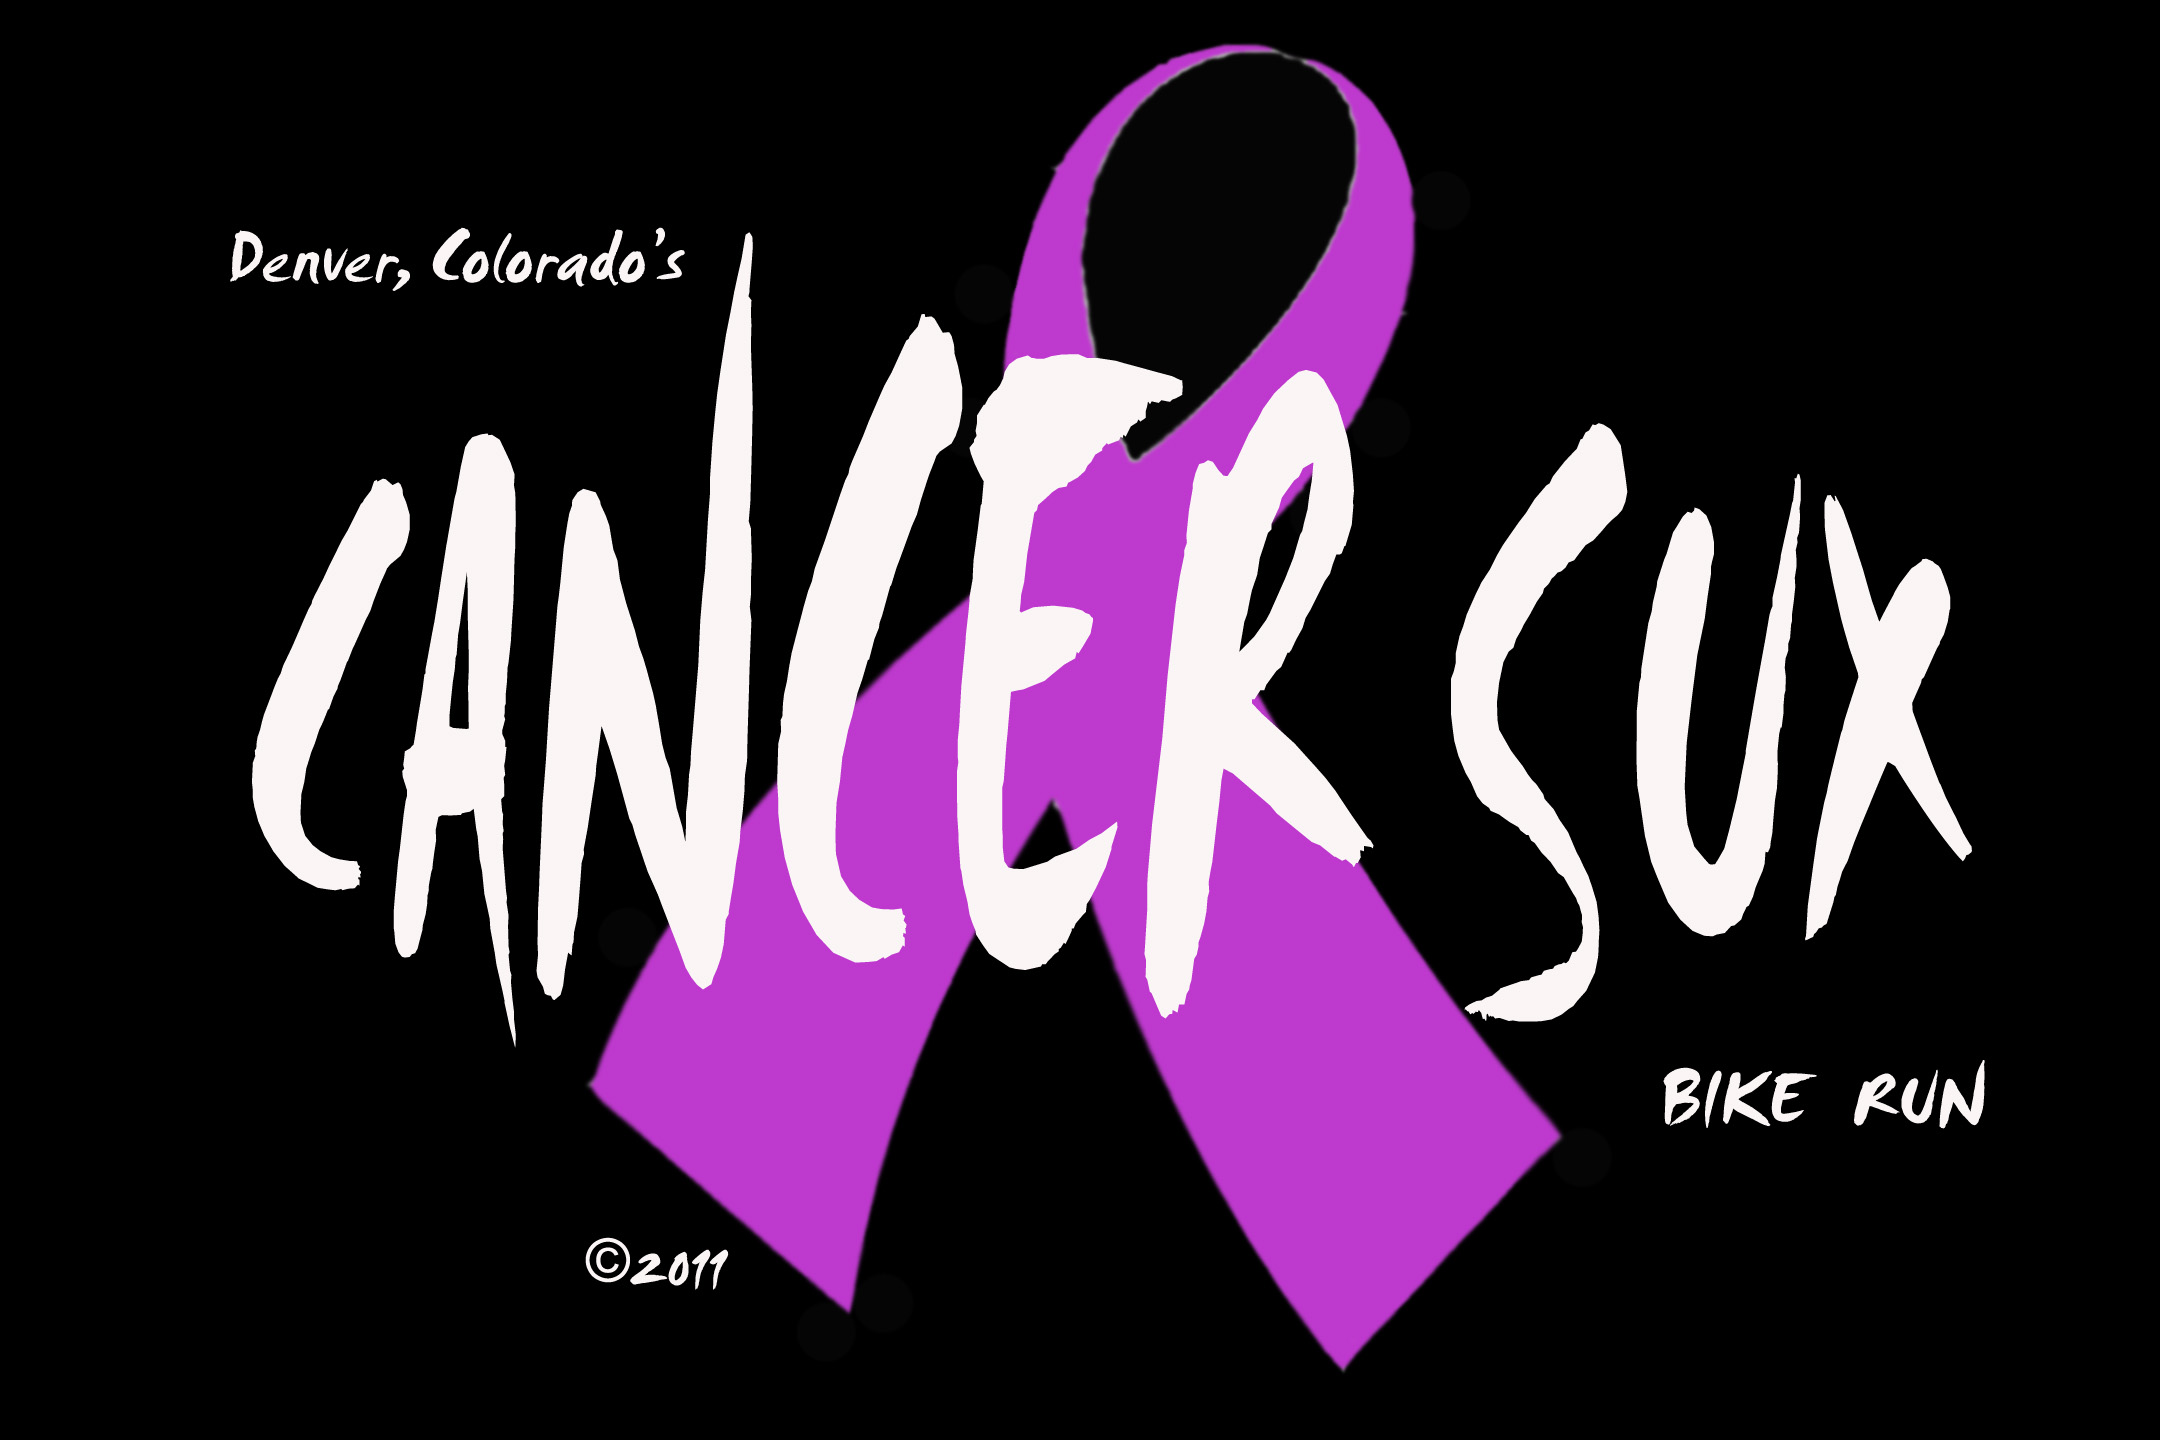 CANCER RUN LOGO copy.jpg